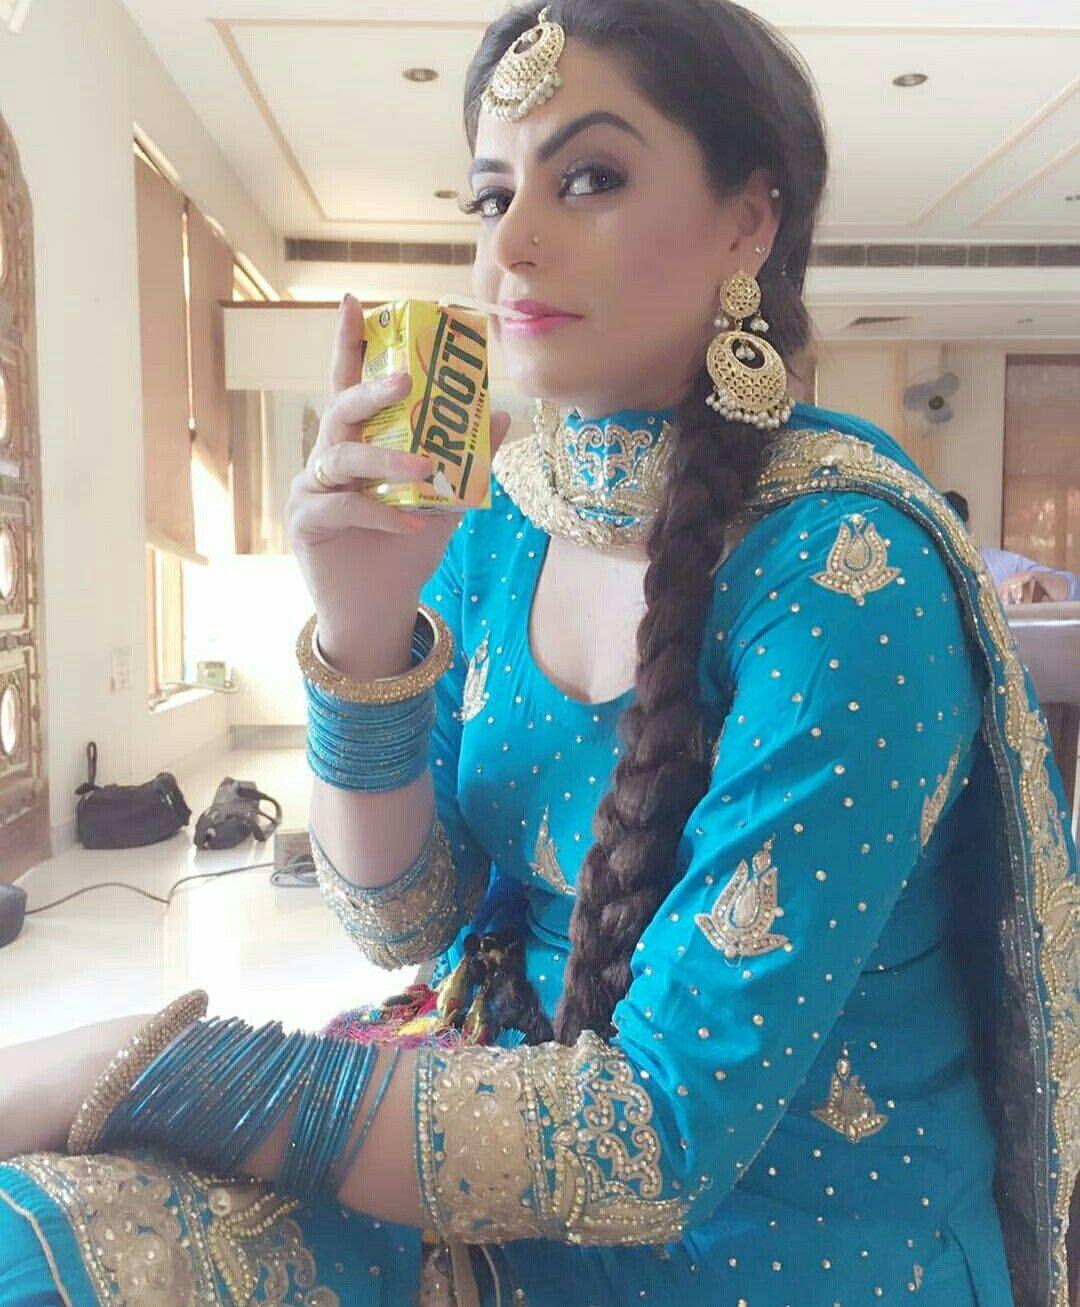 Pin by Kirandeep Kaur on punjabi suits lovr | Pinterest | Punjabi ...